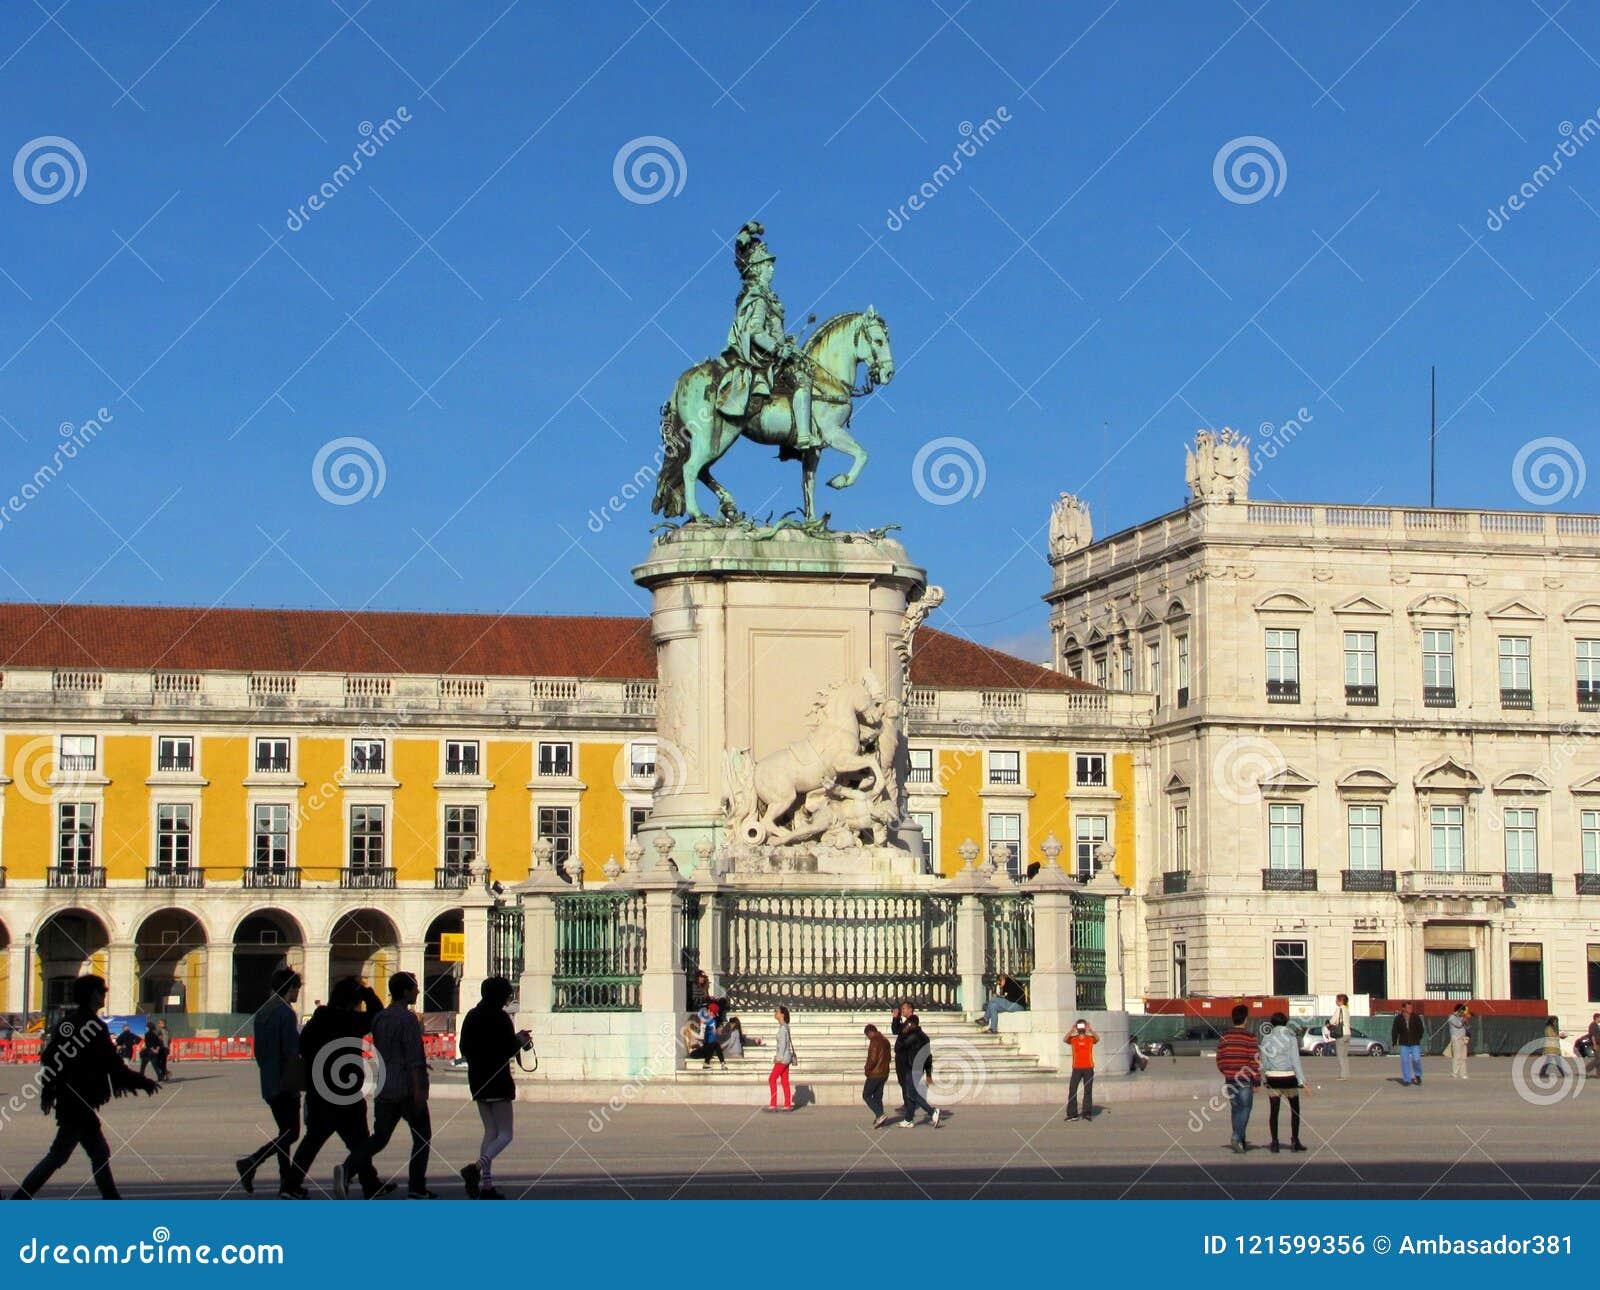 Praca做Comercio与何塞国王雕象的商务正方形我